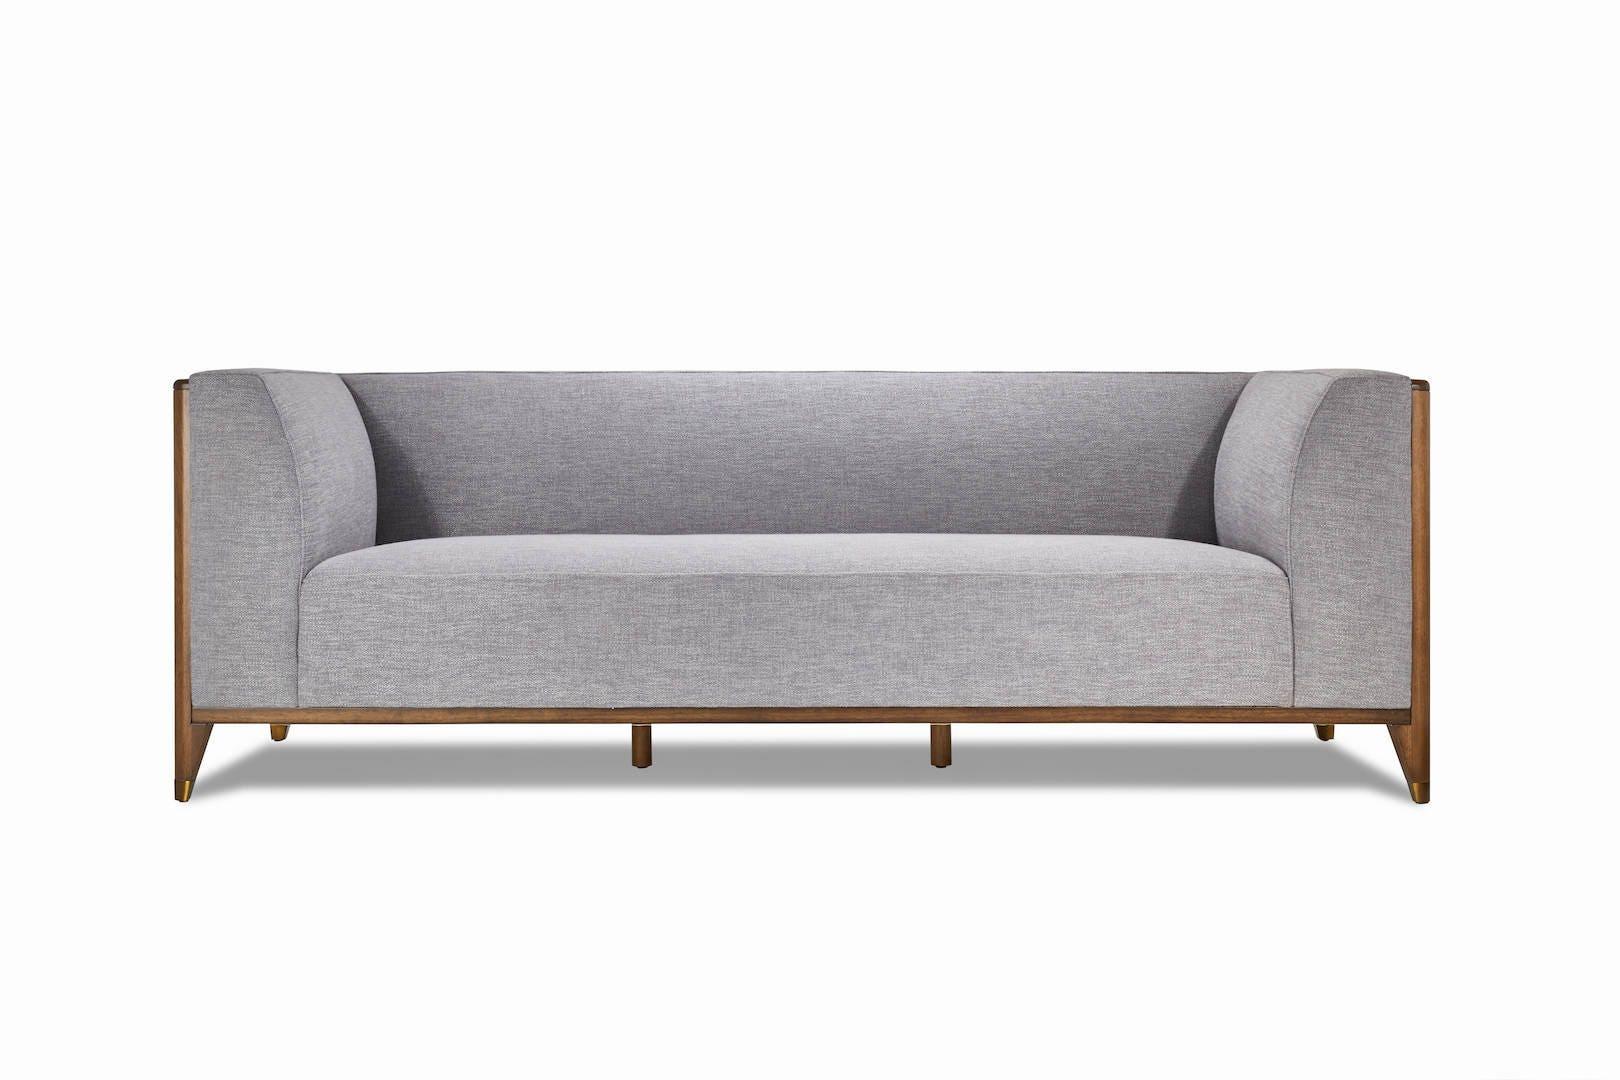 Walnut Mid Century Sofa 3 Seater, Wood frame sofa, Mid Century sofa ...